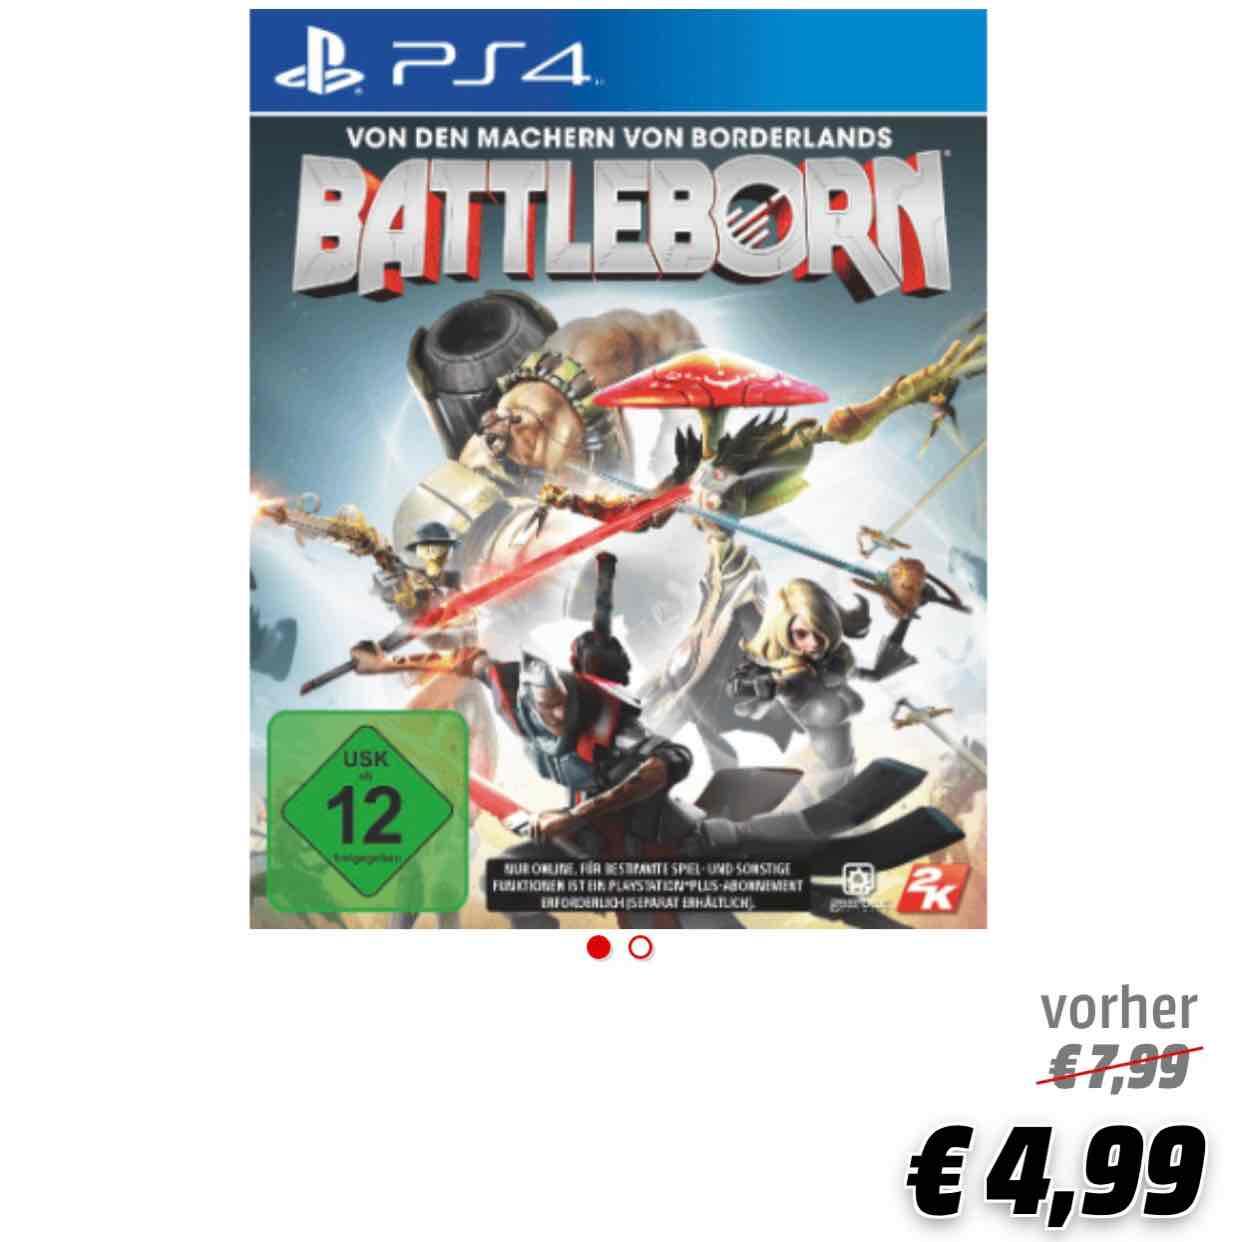 Battleborn PS4 jetzt bundesweit 4,99€ [ Abholung im Media Markt ]